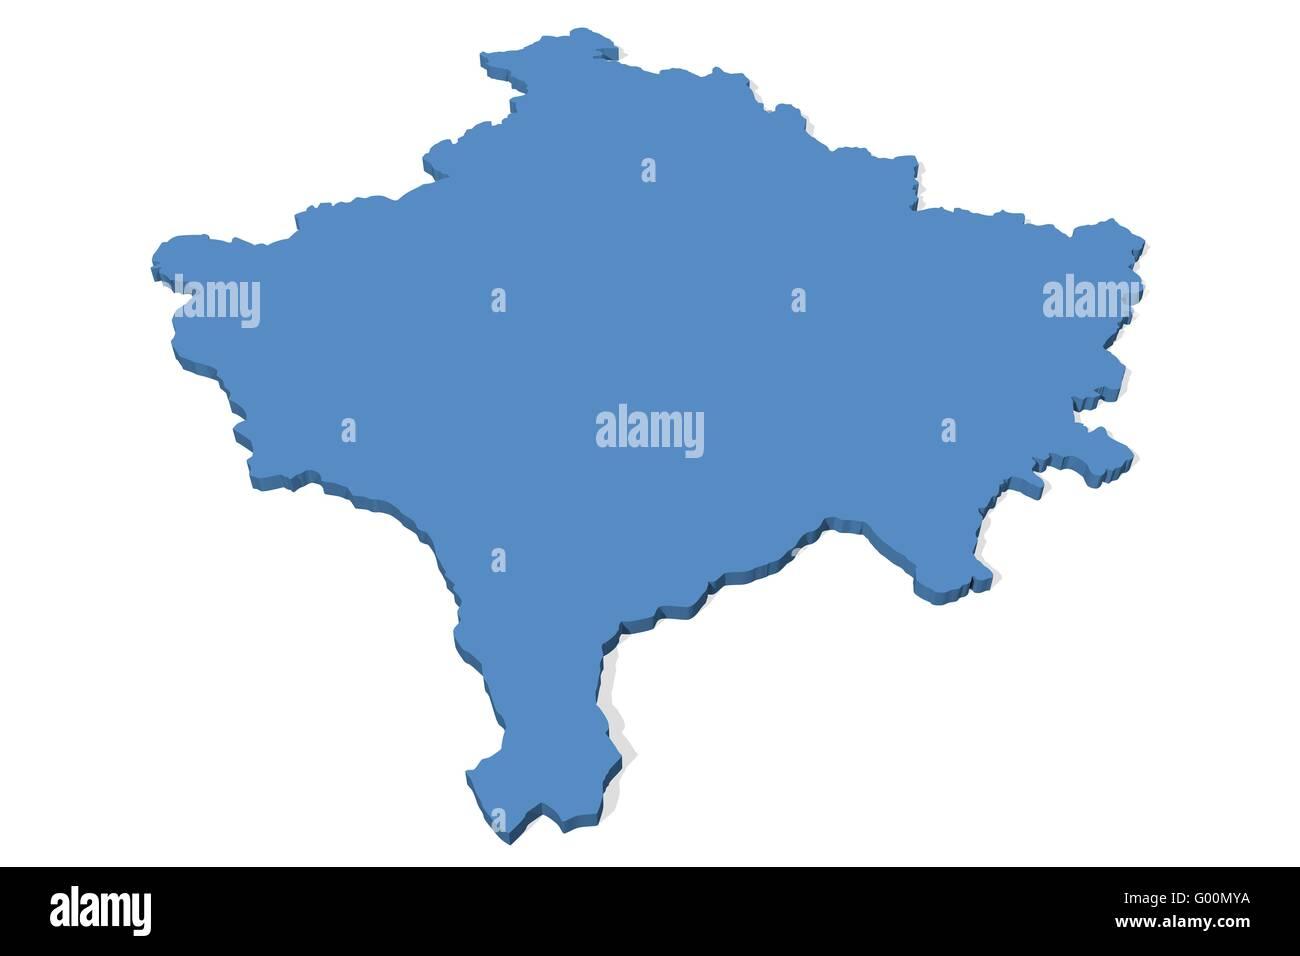 Kosovo map stock photos kosovo map stock images alamy kosovo map stock image gumiabroncs Image collections